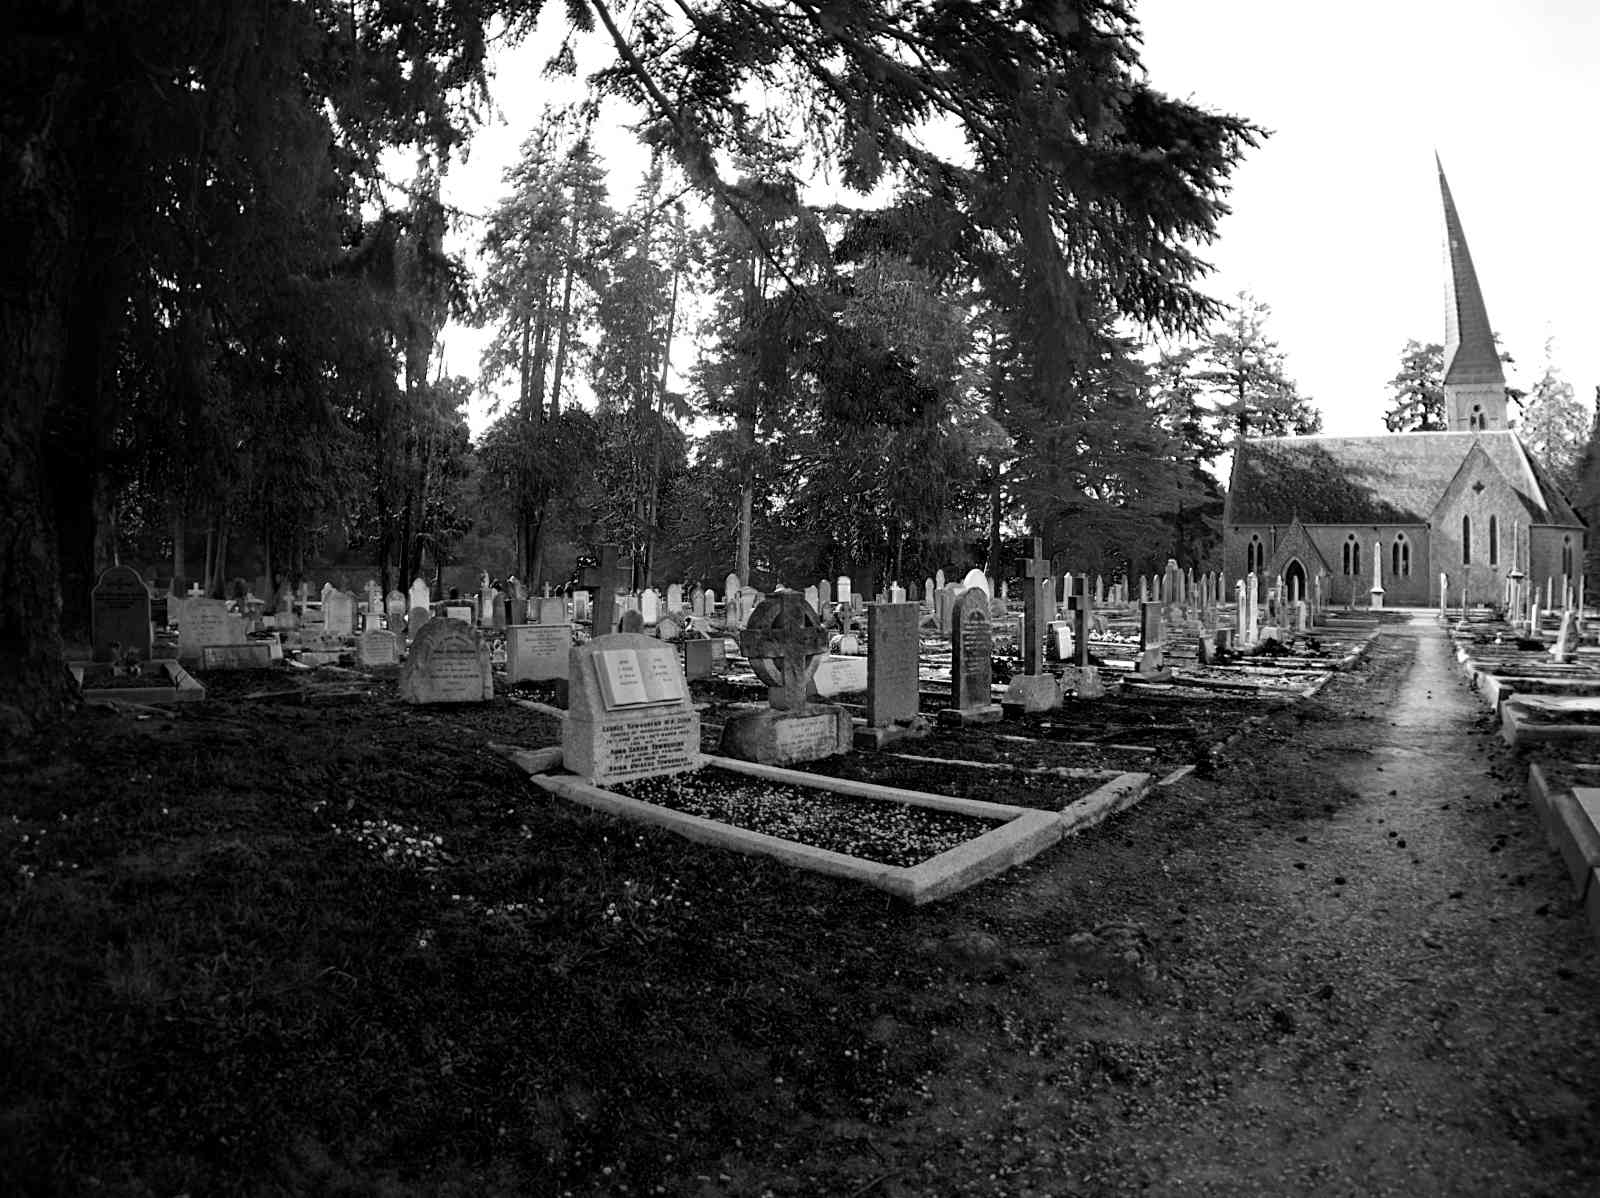 Friedhof Enniskerry 09, Olympus PEN E-PL7